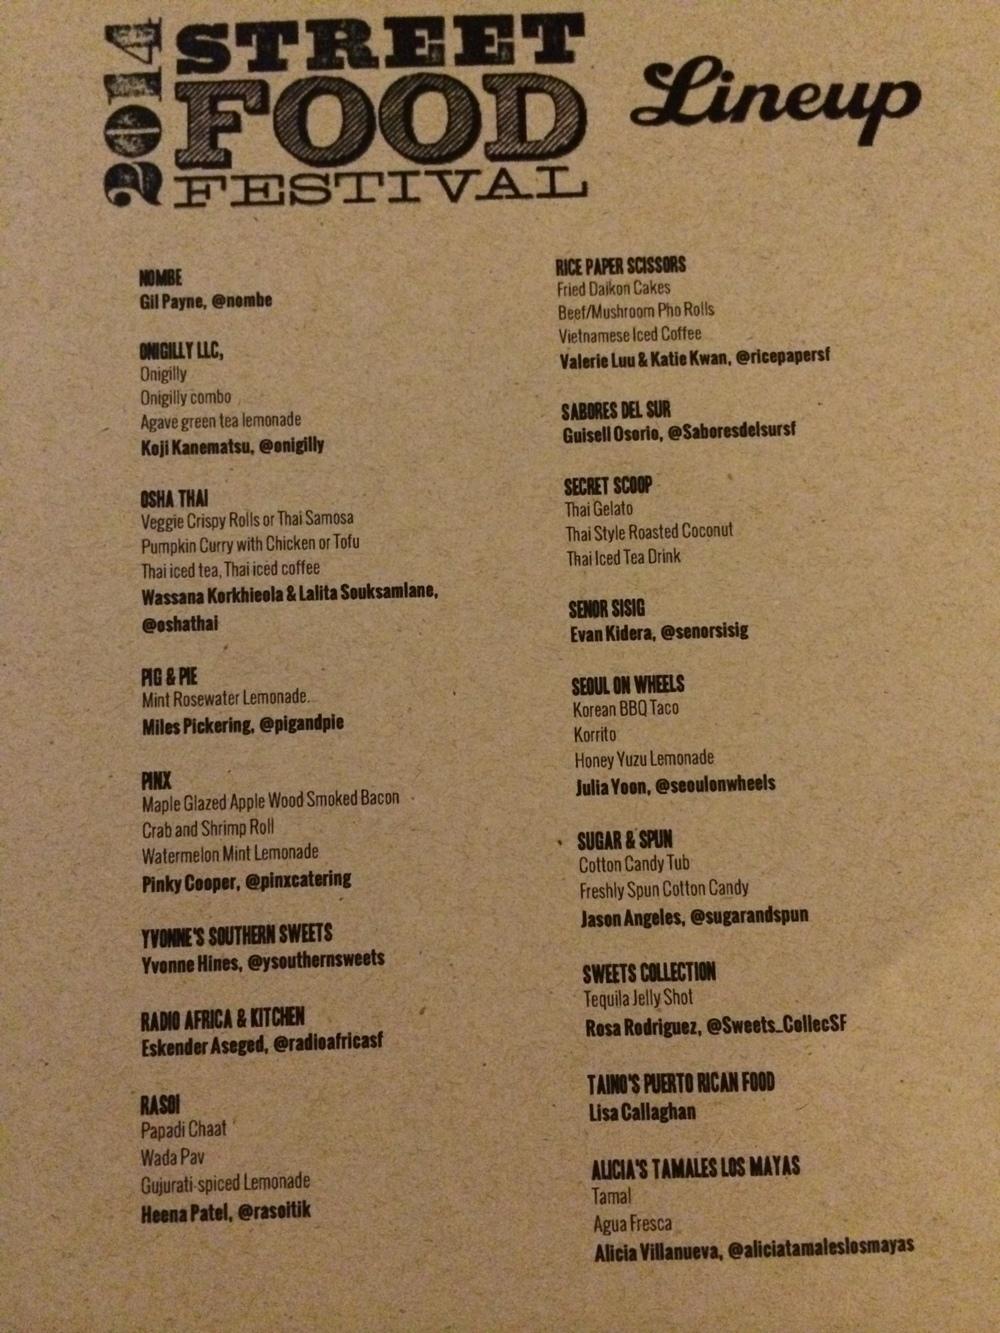 2014 SF Street Food Festival Menu - 3/5